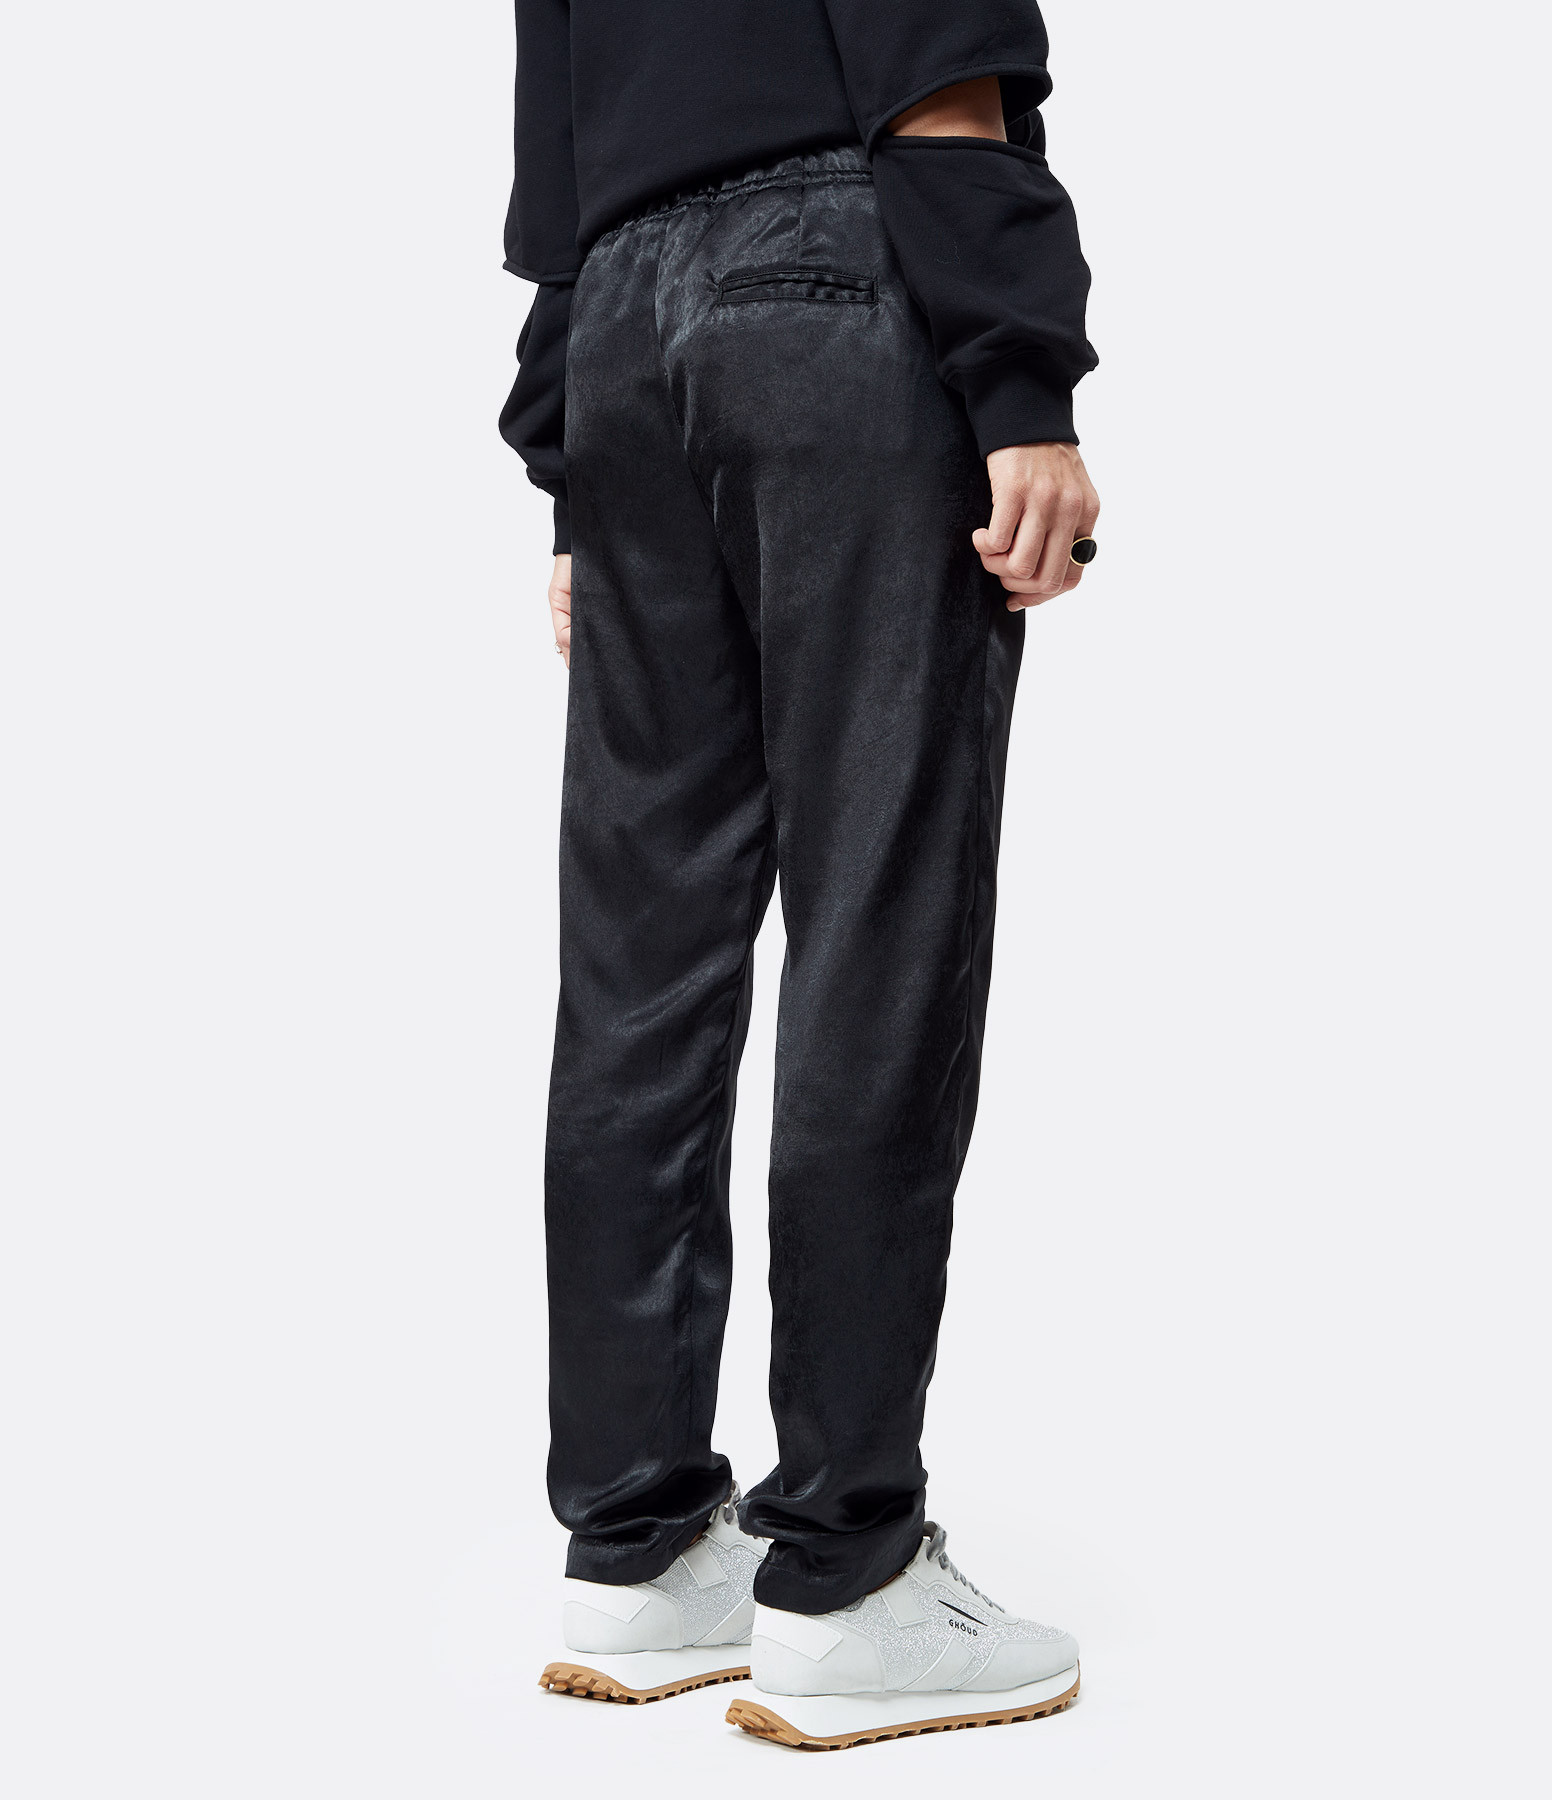 OVERLOVER - Pantalon Yucca Satin Noir